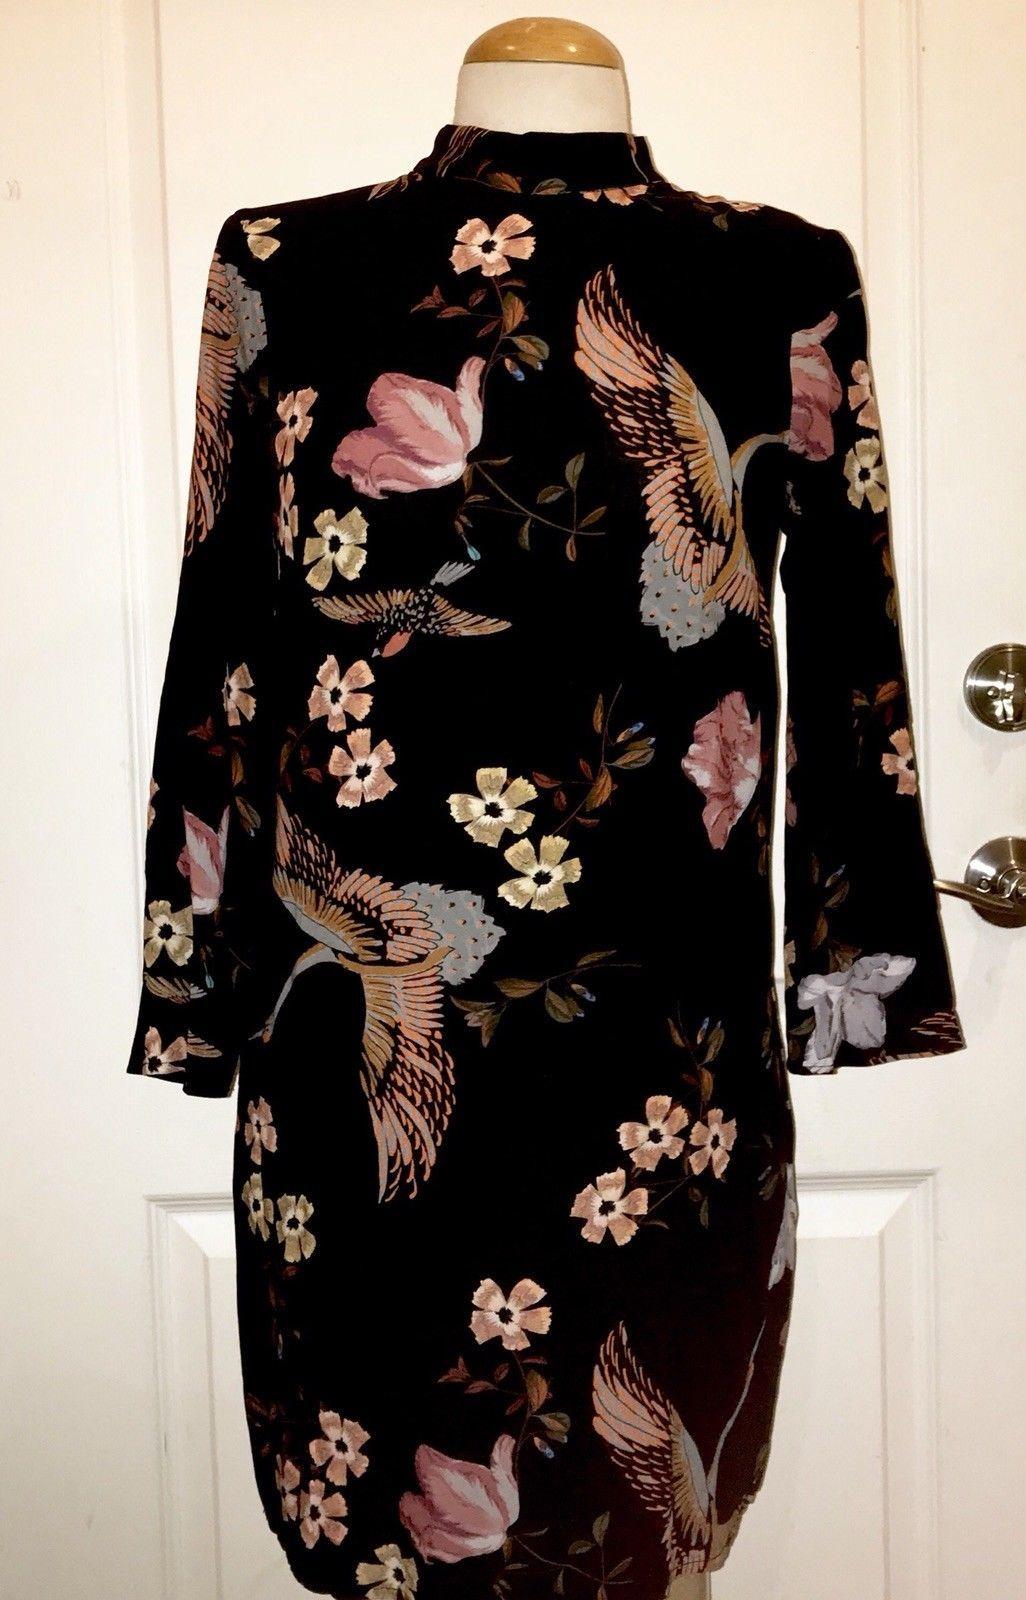 New Zara Black Long Sleeved Floral Bird High Neck Dress Xs Black Long Sleeve Fashion Dresses [ 1600 x 1026 Pixel ]